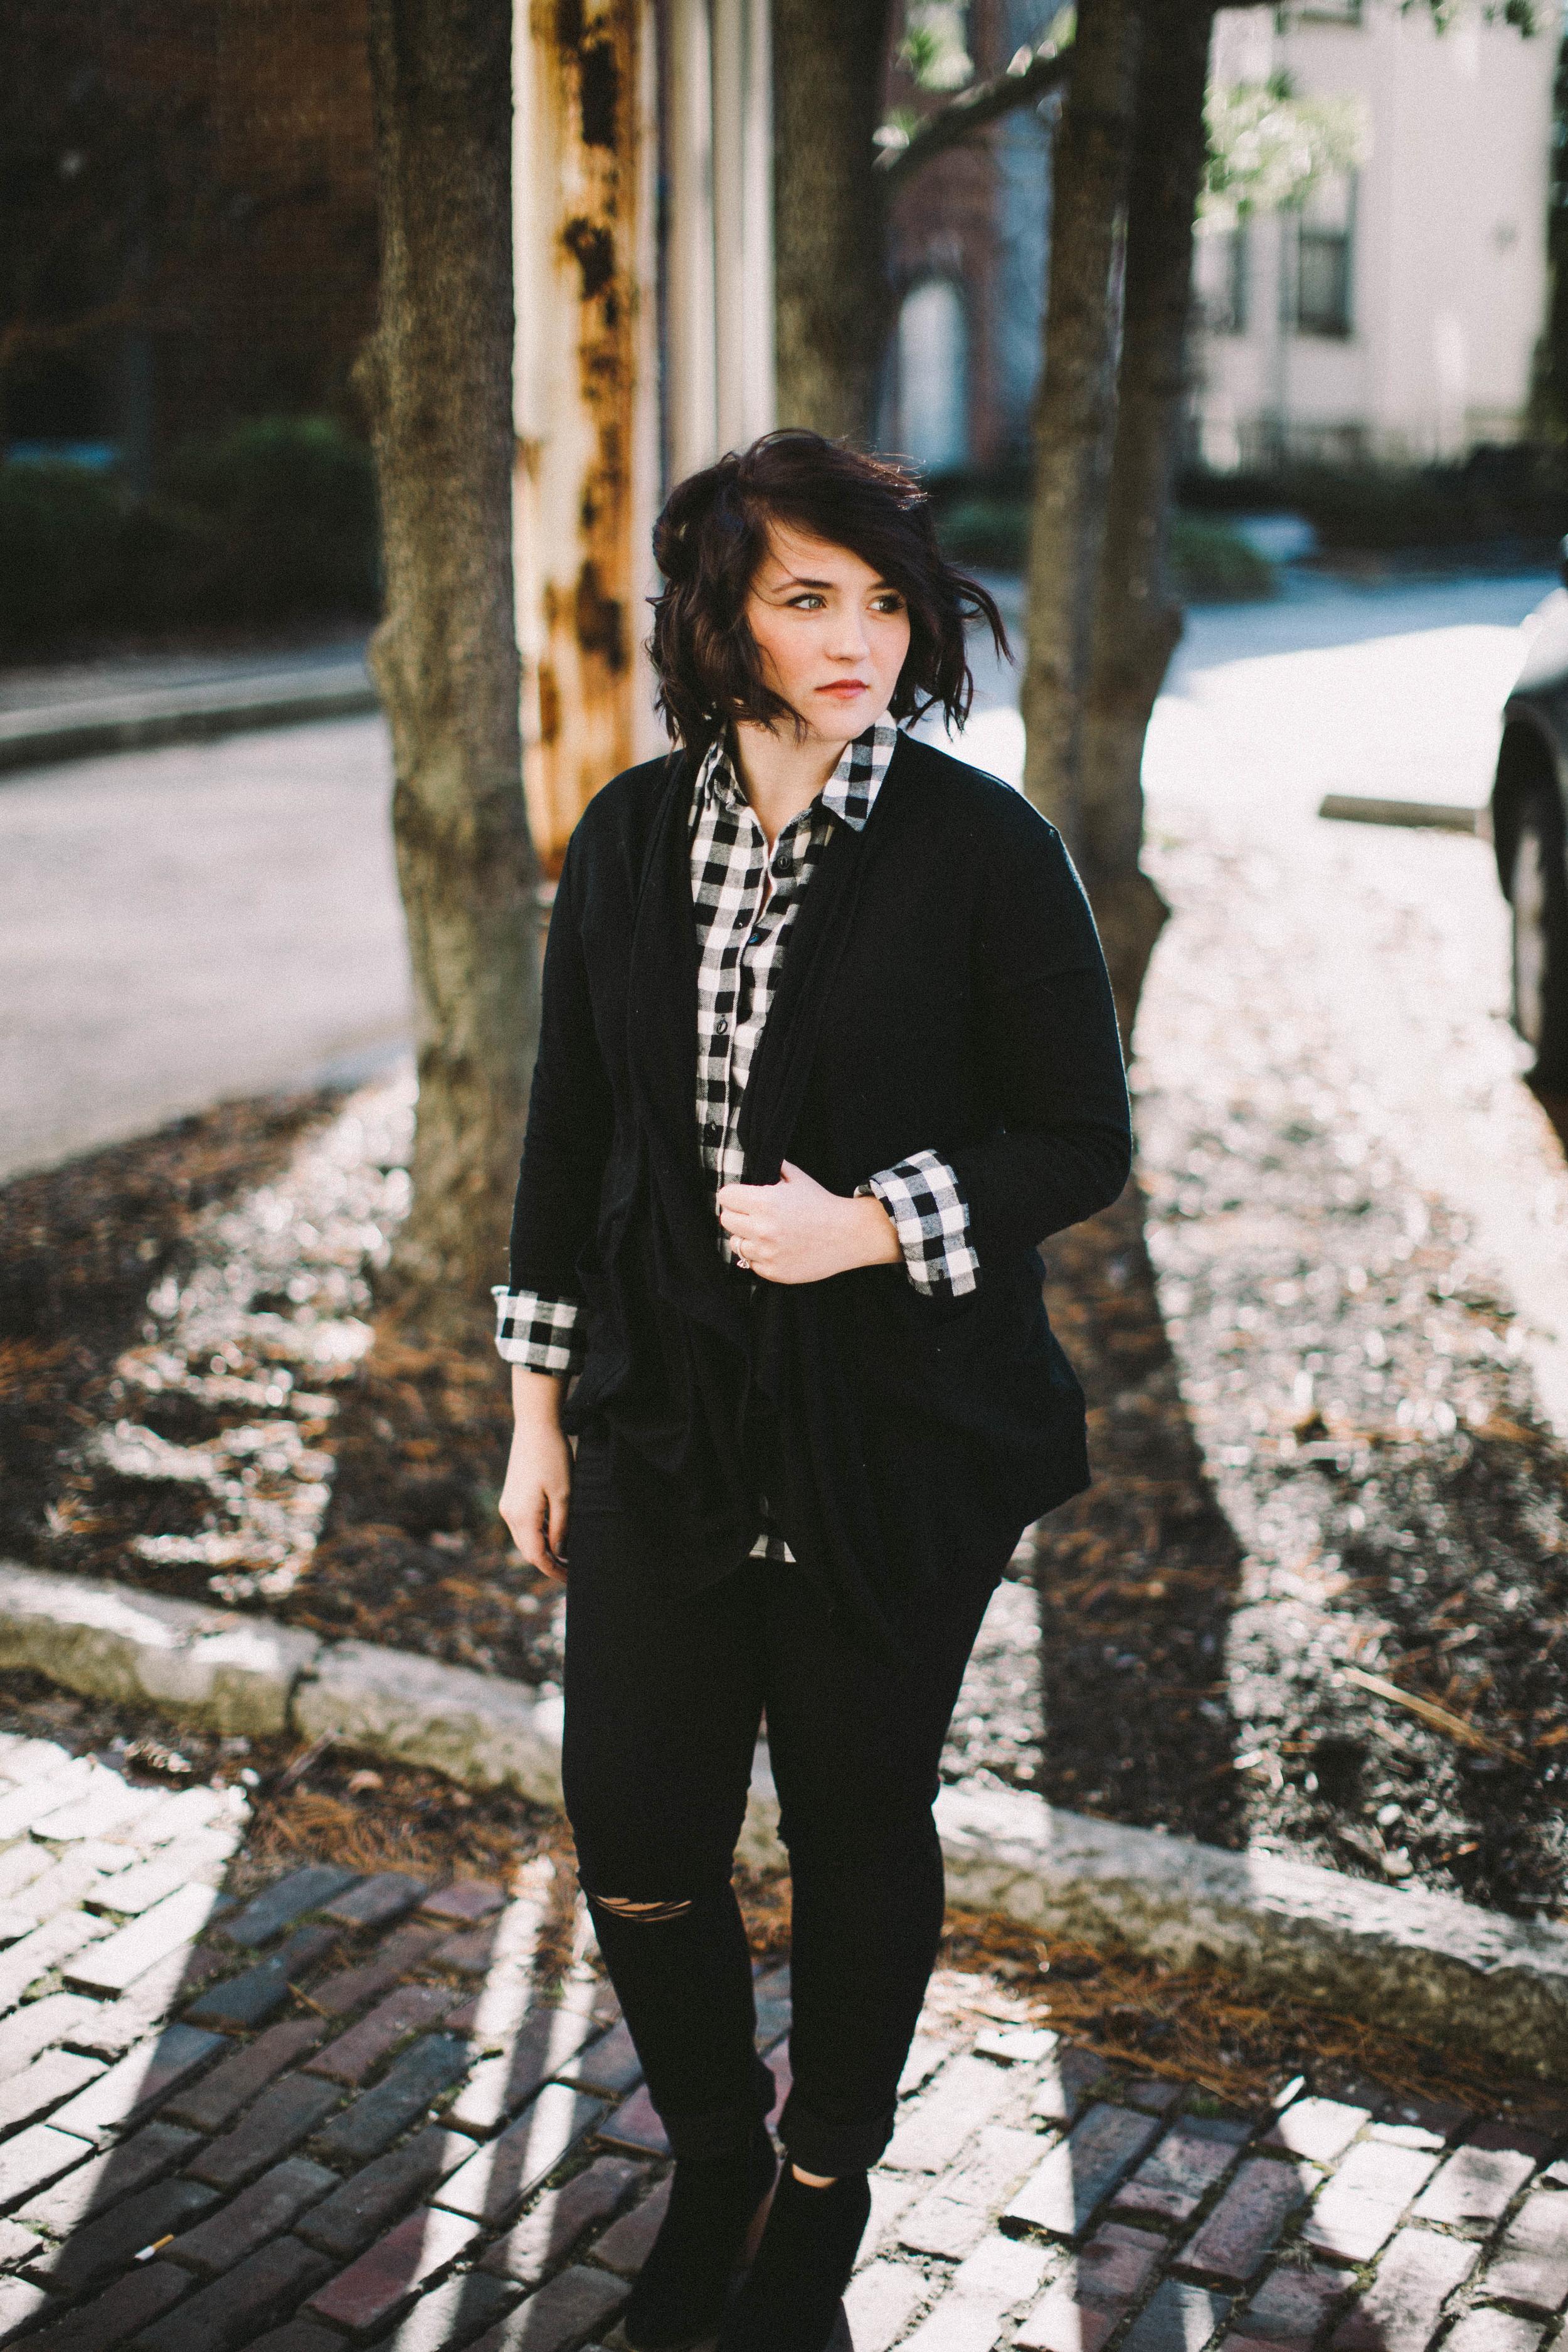 Black, White + Flannel via www.chelceytate.com